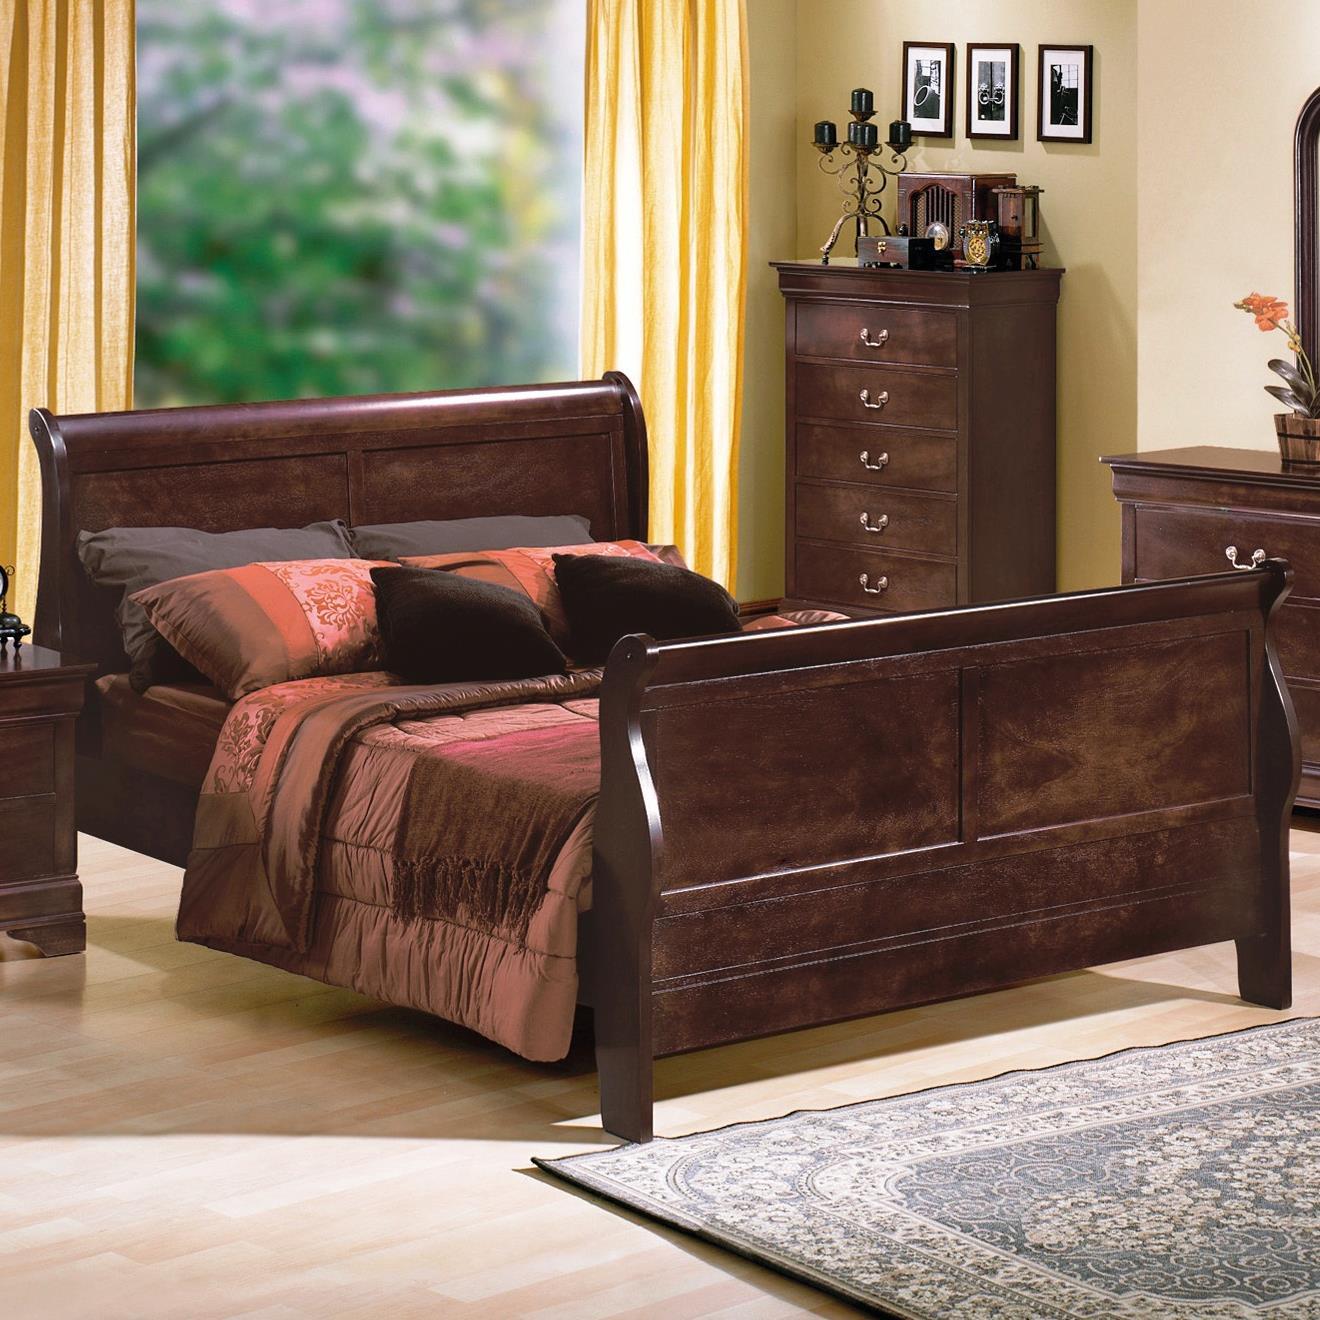 Crown Mark Louis Phillipe Queen Bed - Item Number: B3775-Q-HBFB+RAIL